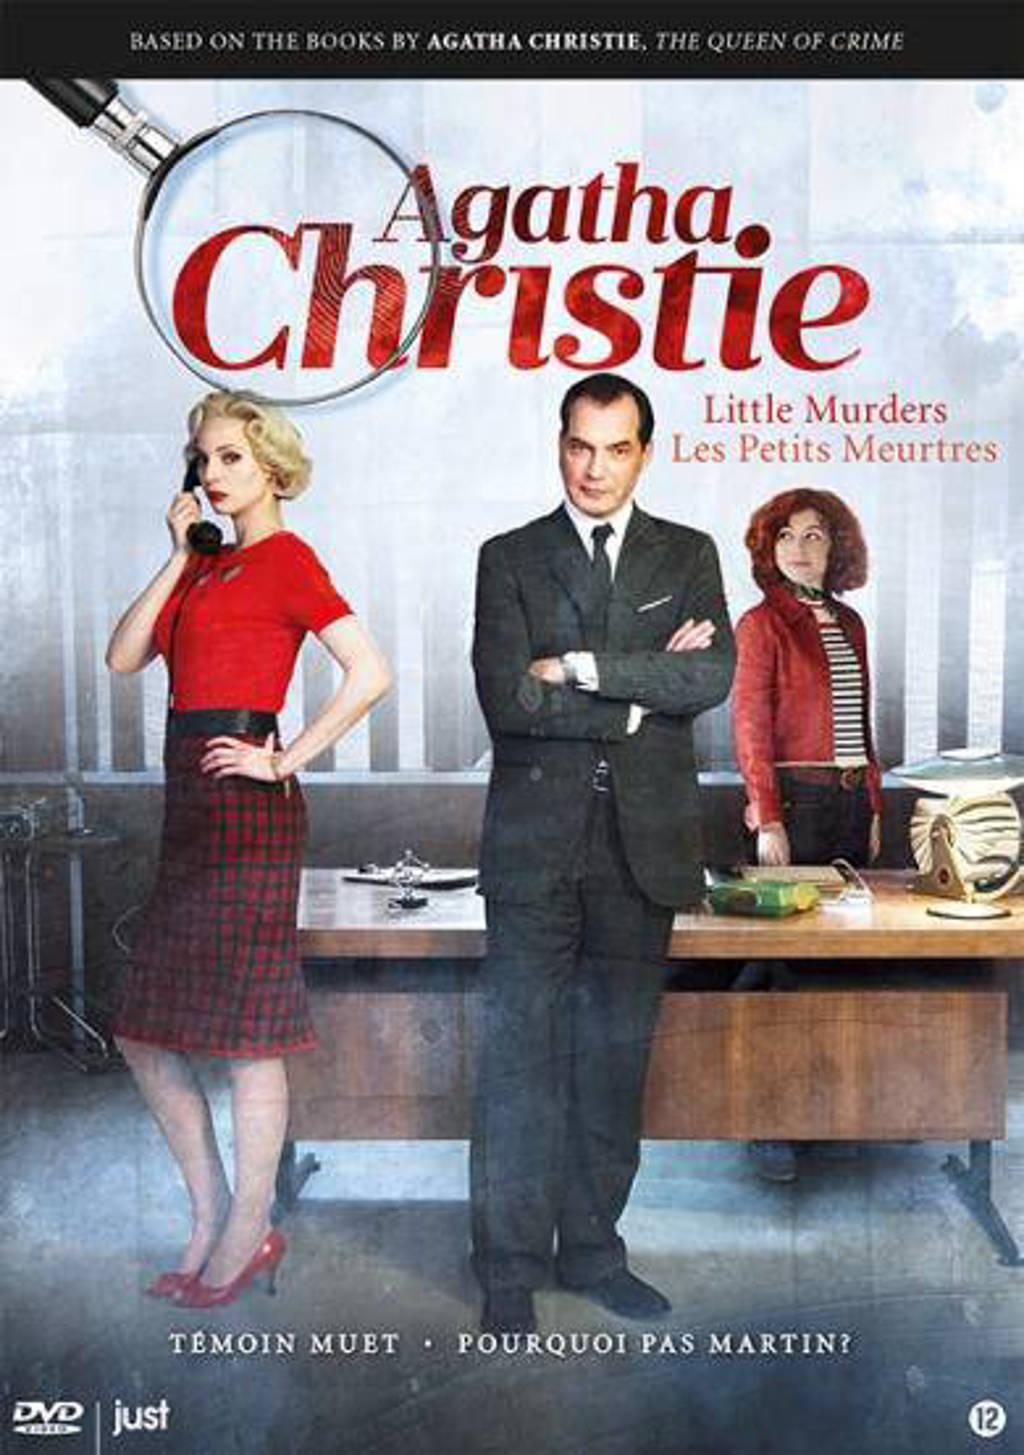 Agatha Christie - Little murders 4 (DVD)